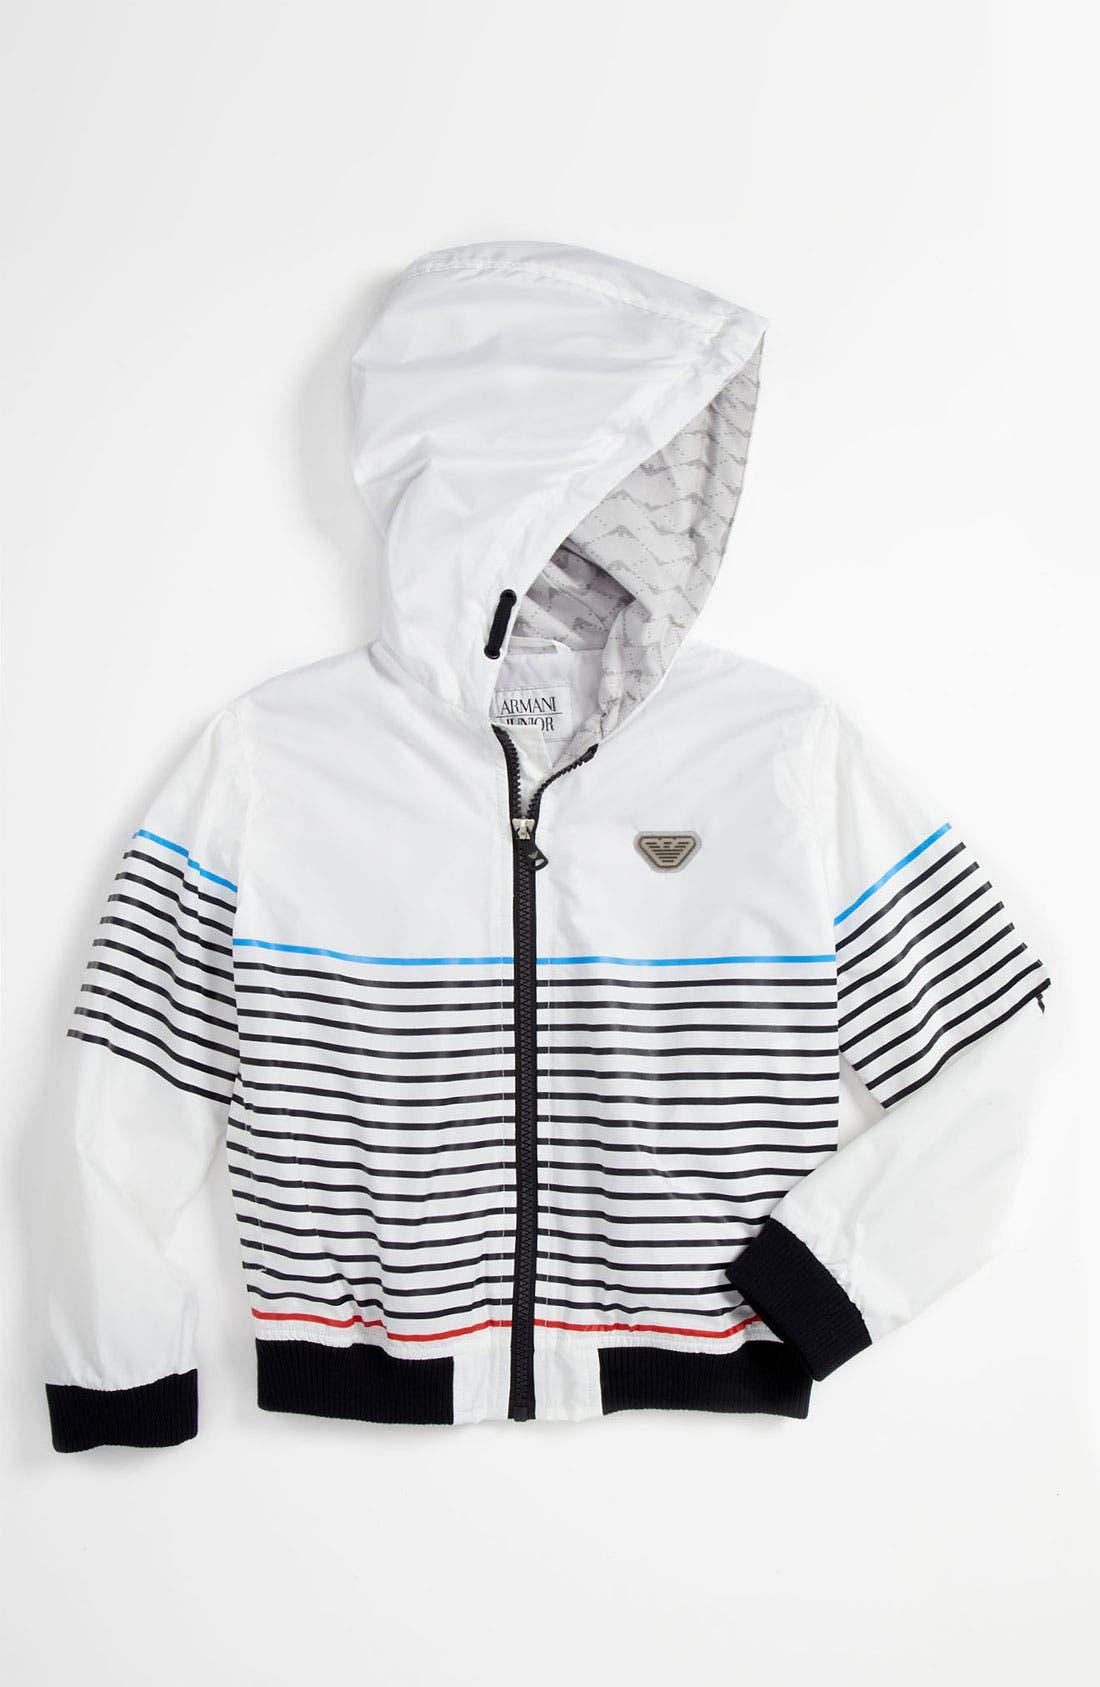 Alternate Image 1 Selected - Armani Junior Stripe Jacket (Toddler)